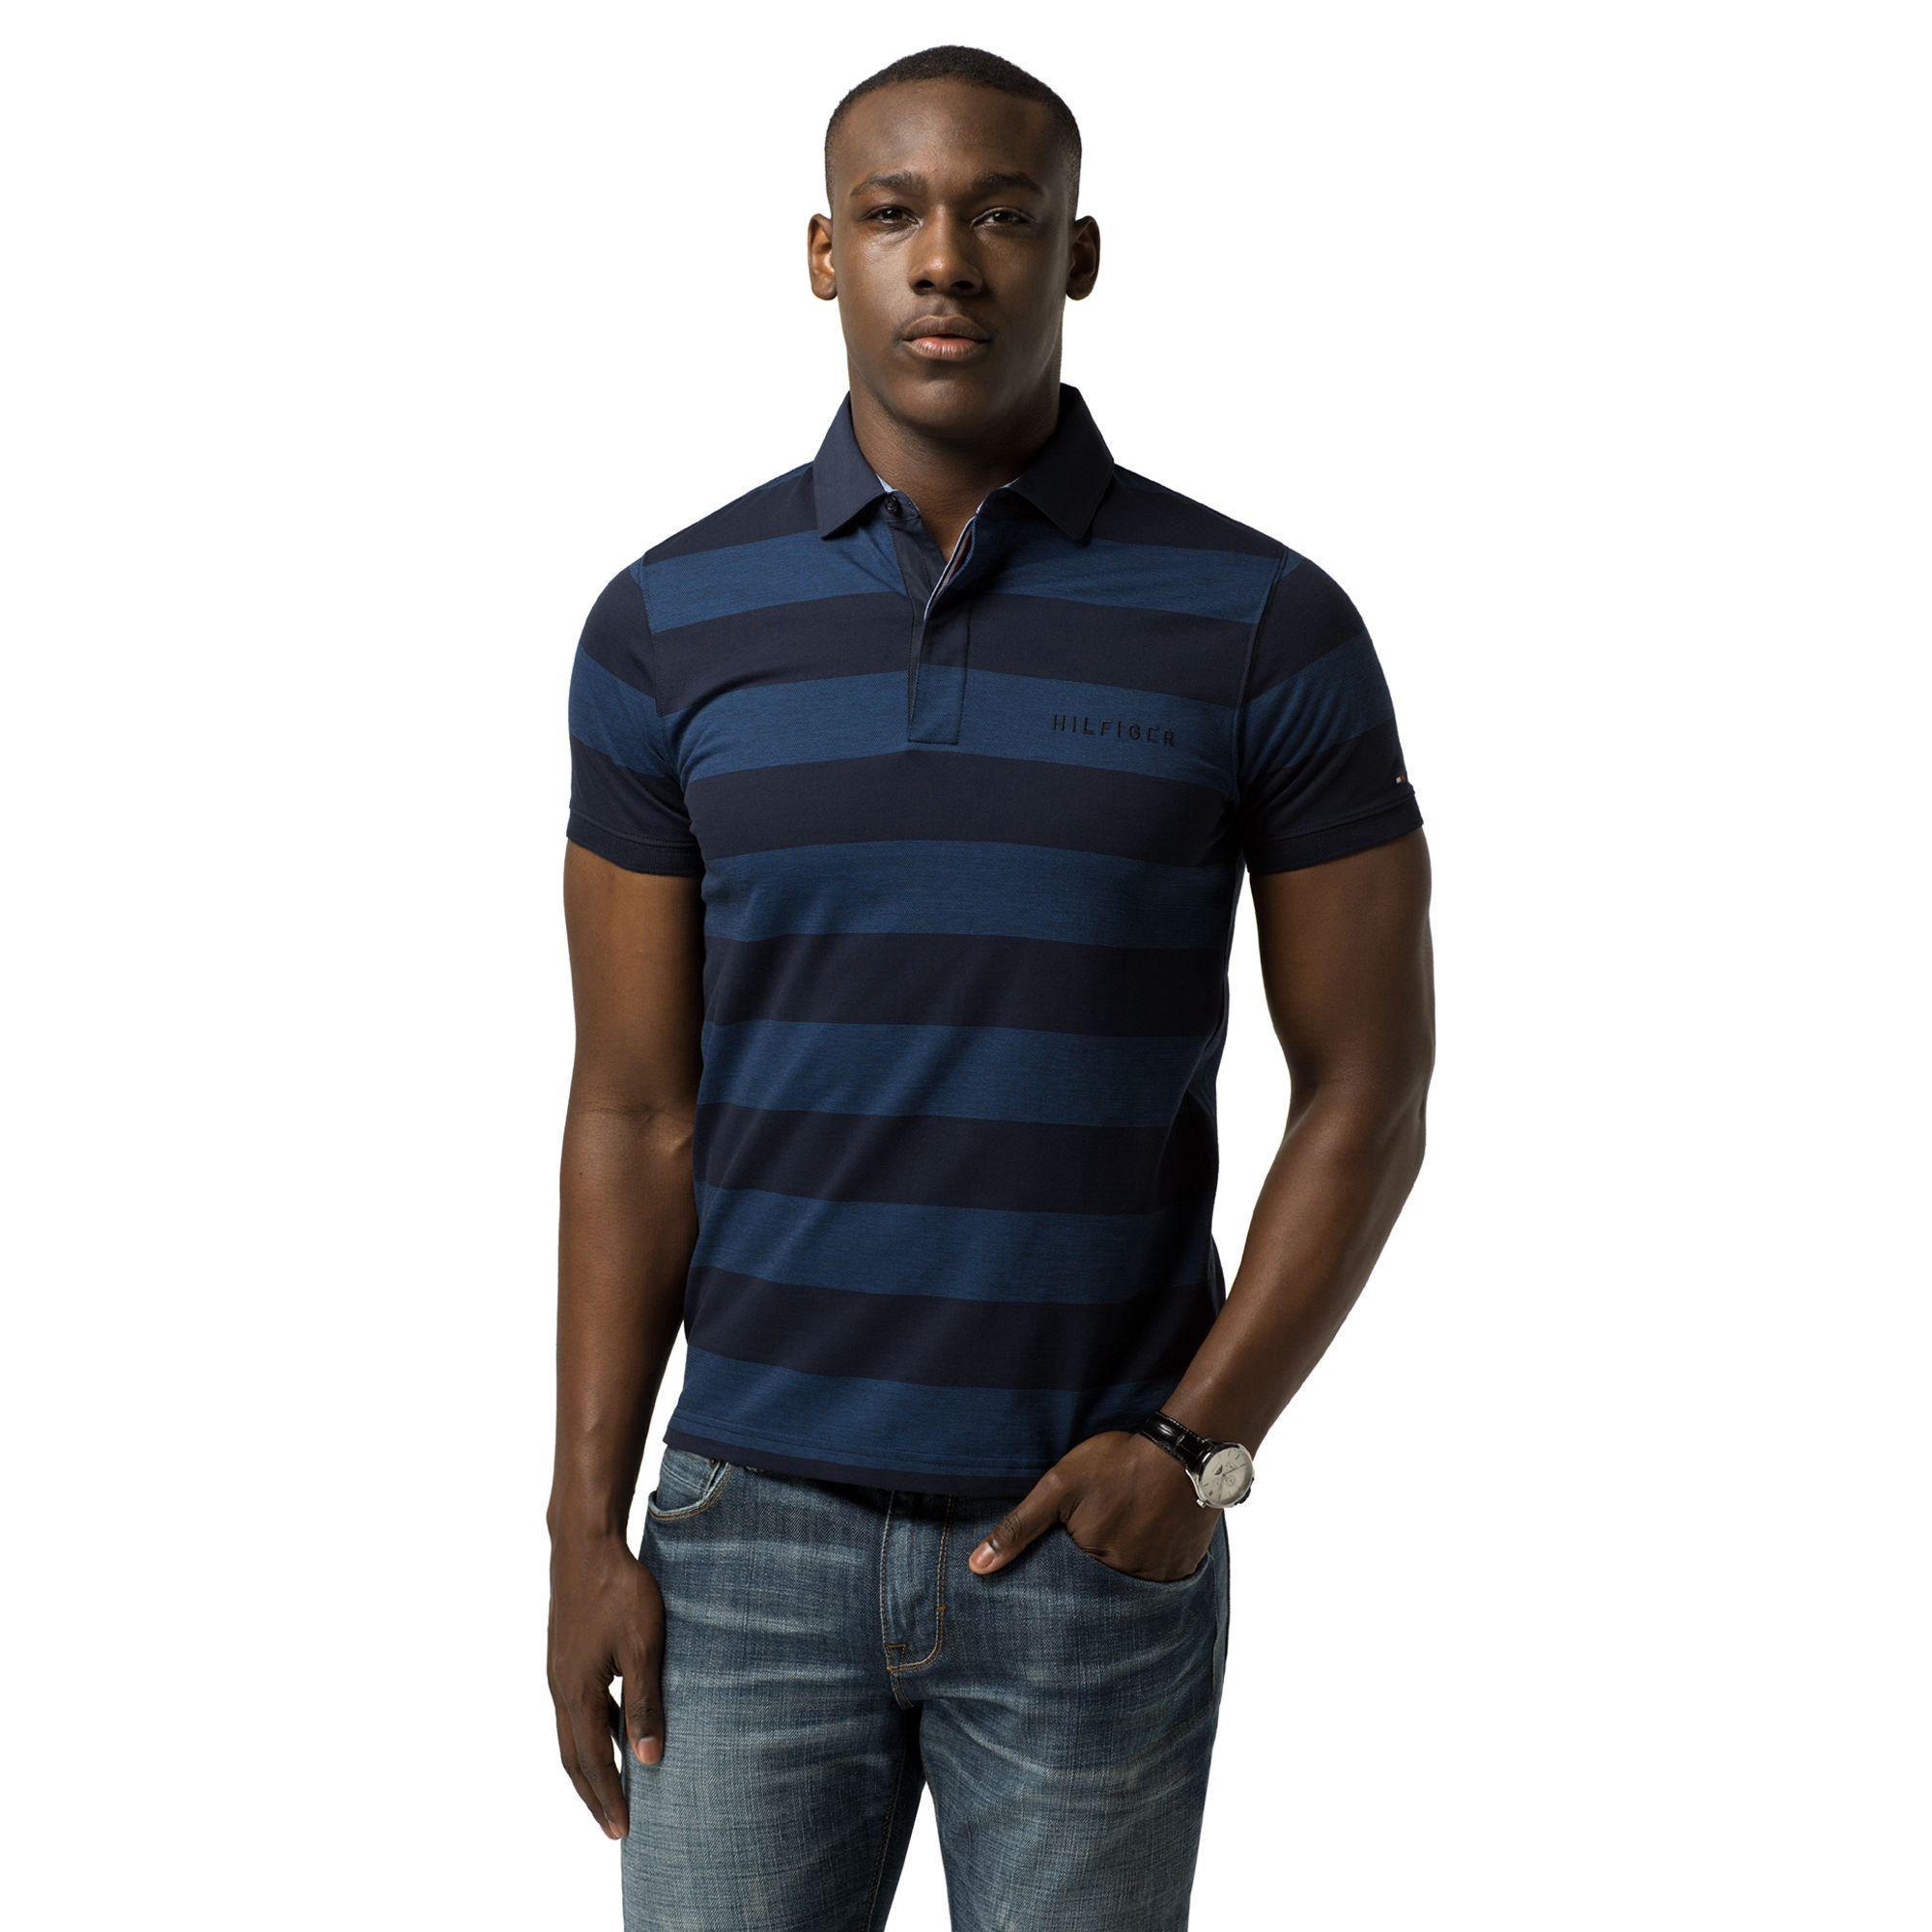 Tommy Hilfiger Slim Fit Polo Sky Captain Blue Depths Modesens Slim Fit Polo Tommy Hilfiger Mens Sportswear